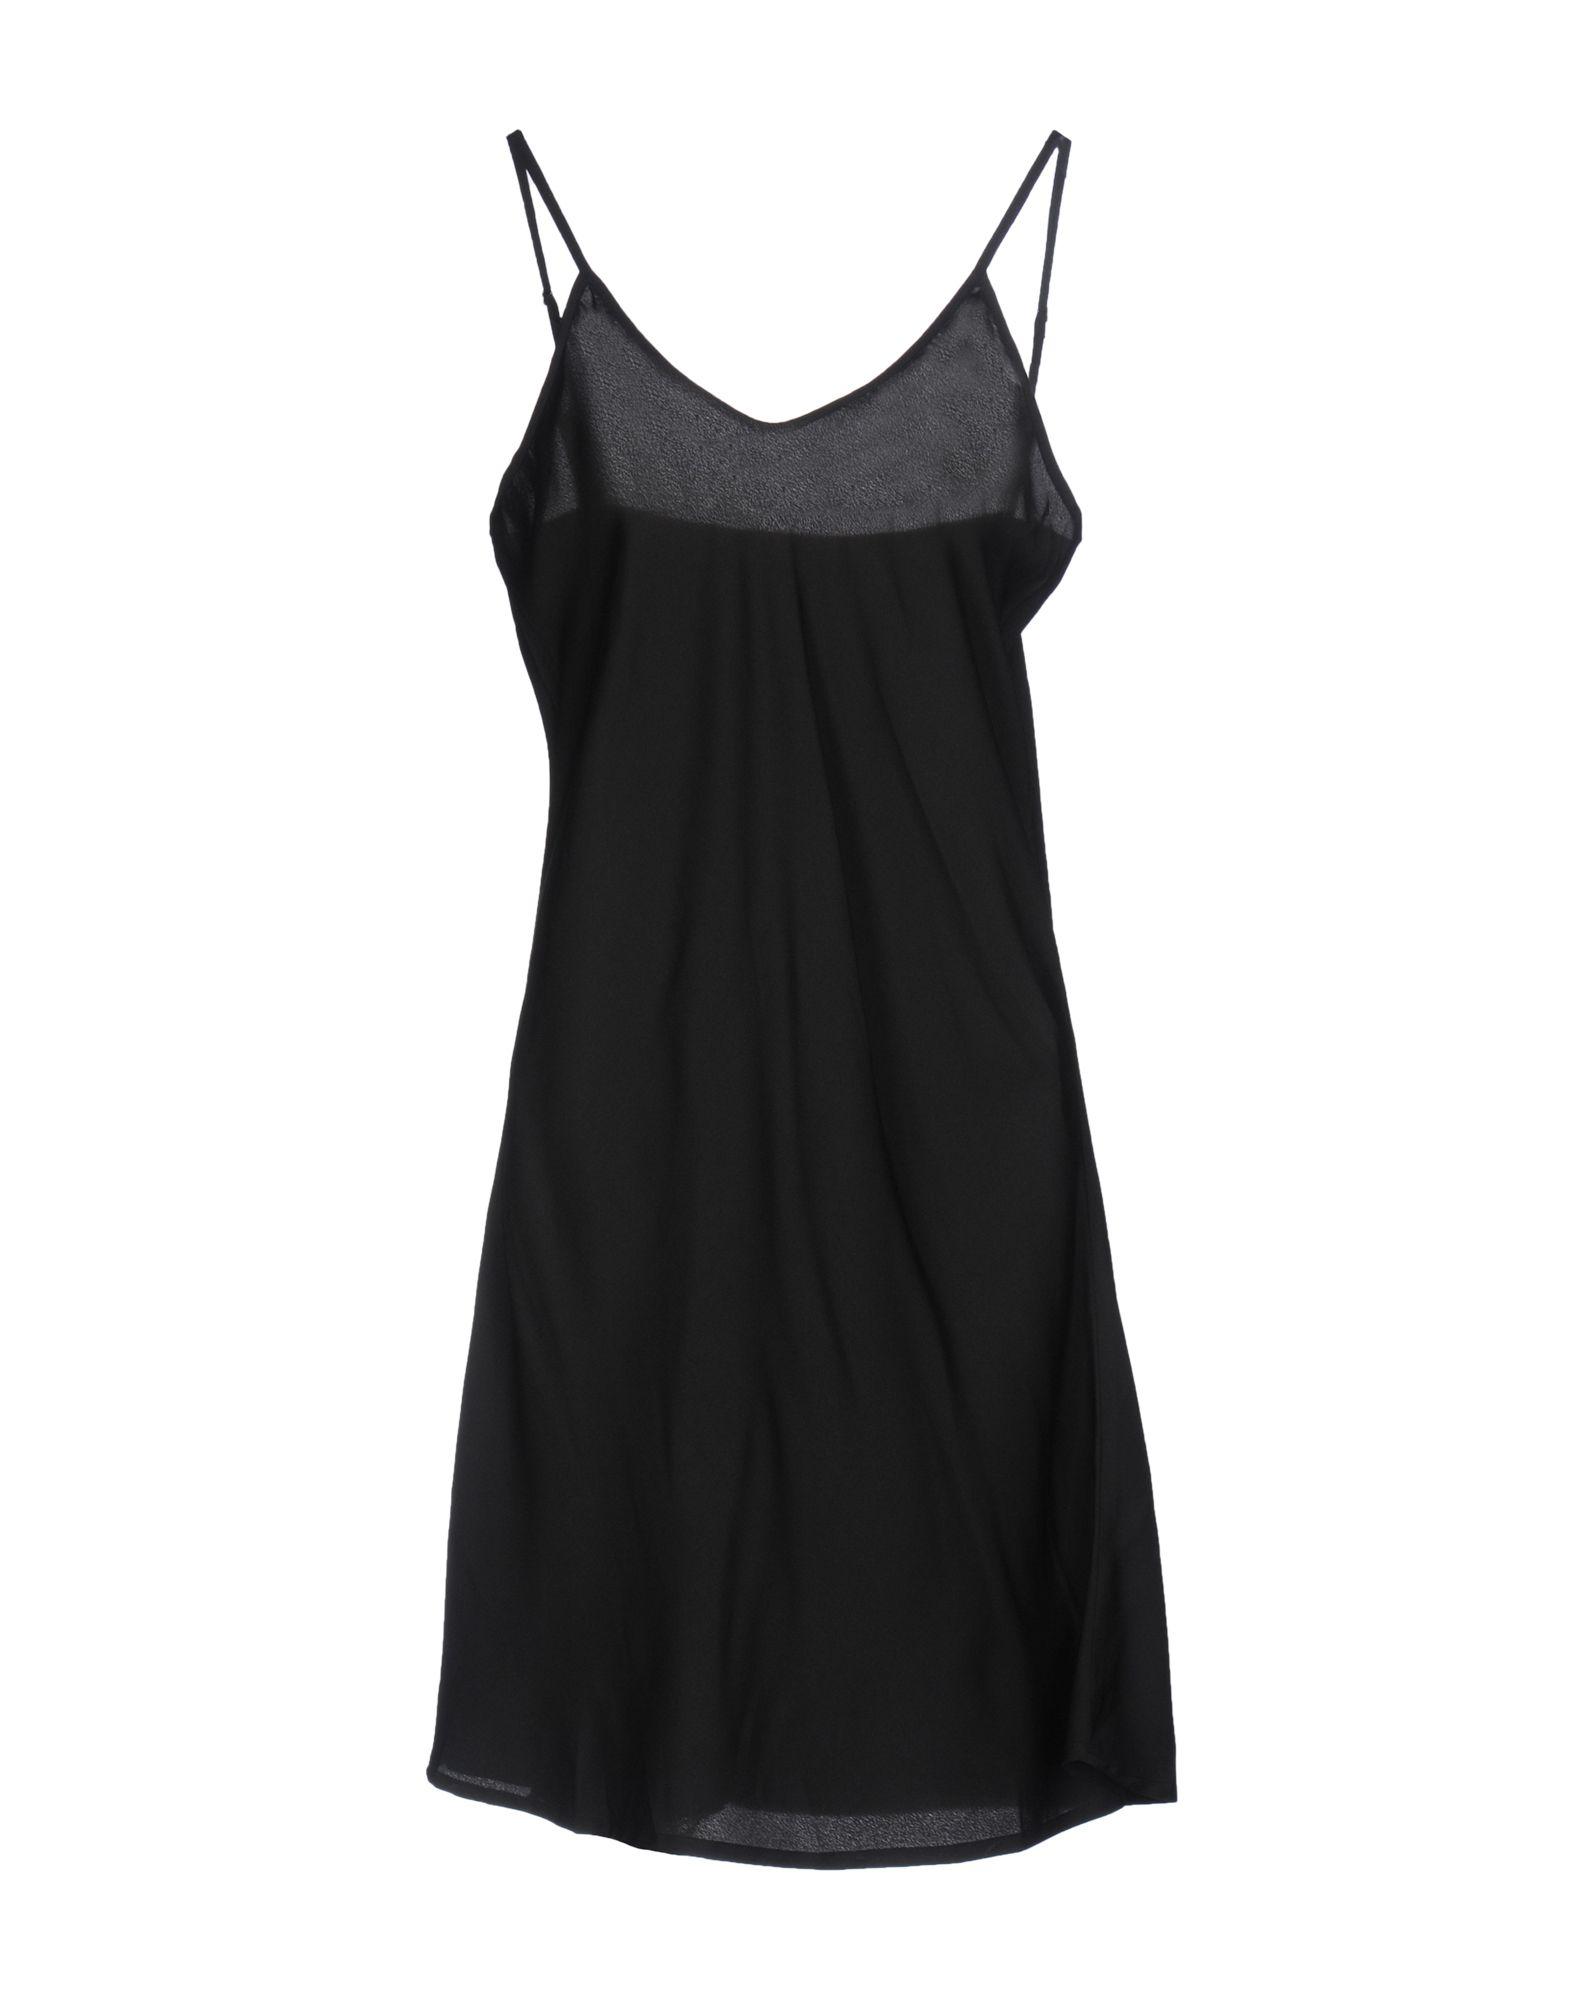 платье preen платье PREEN by THORNTON BREGAZZI Платье до колена